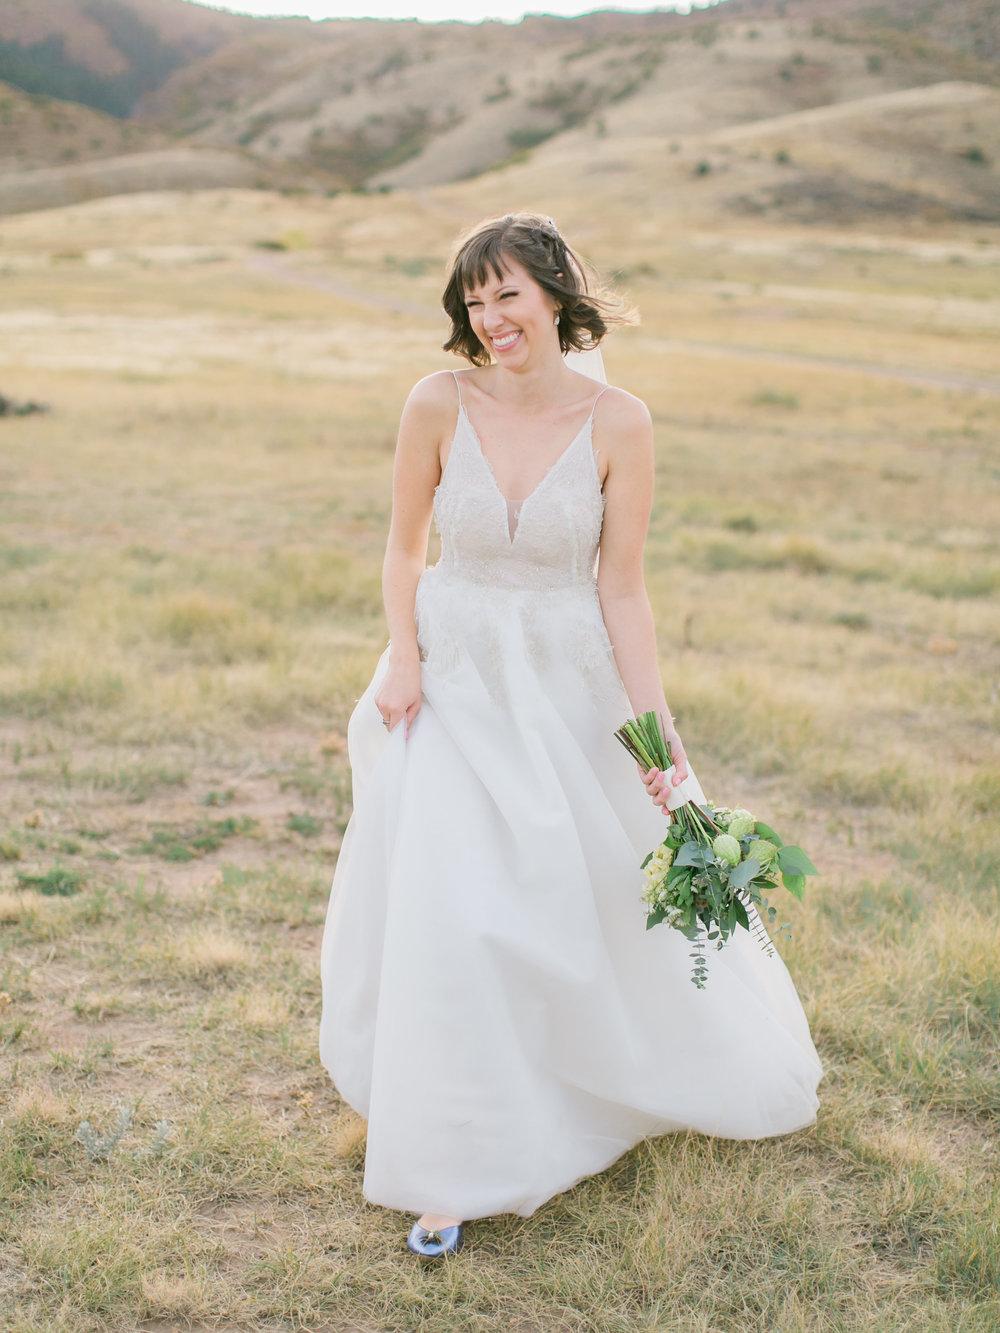 madeline-roberto-wedding-bride-groom-100.jpg